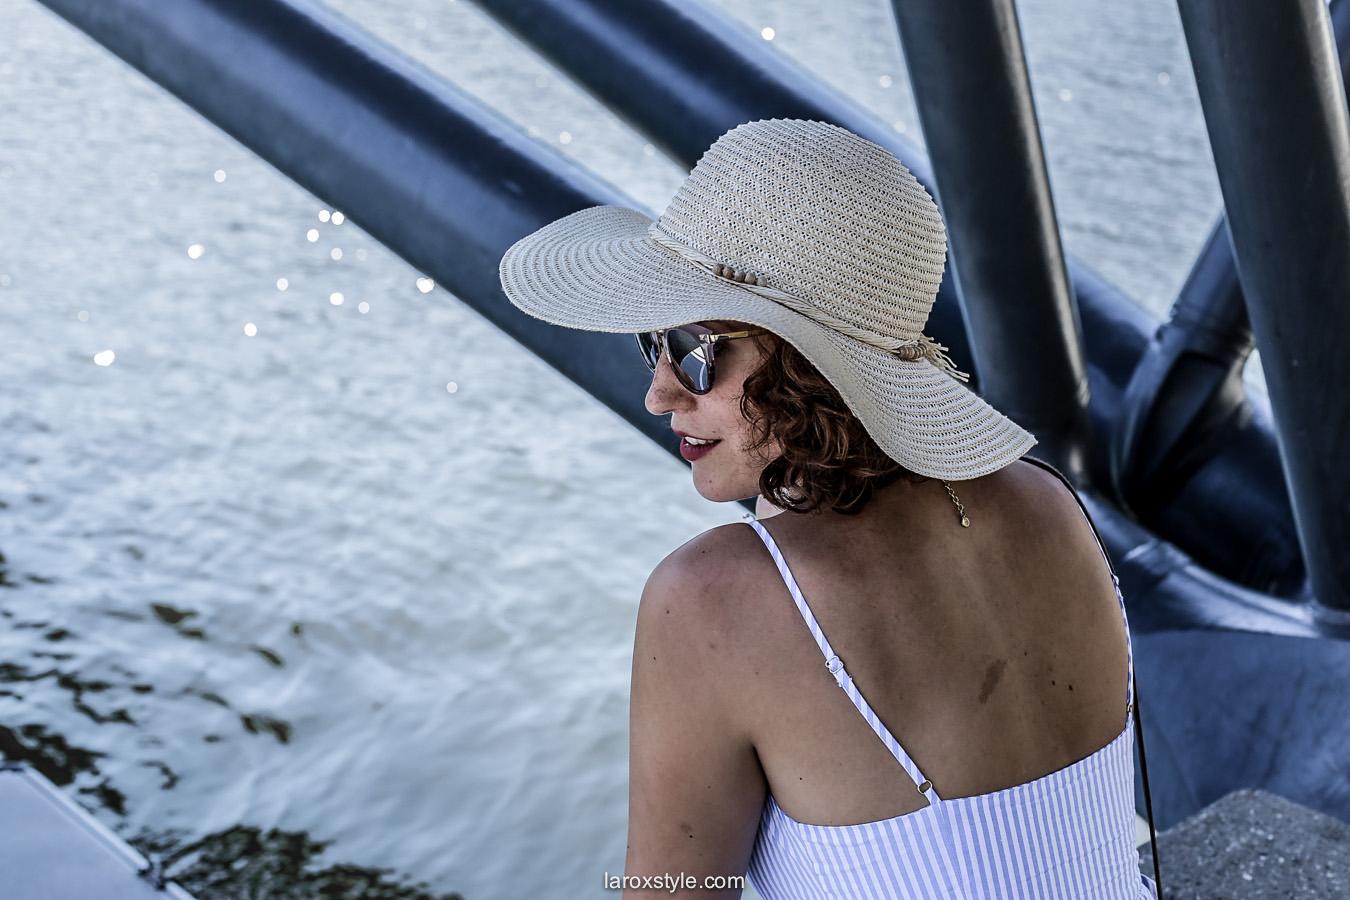 vacances chez soi - staycation - blog mode lyon